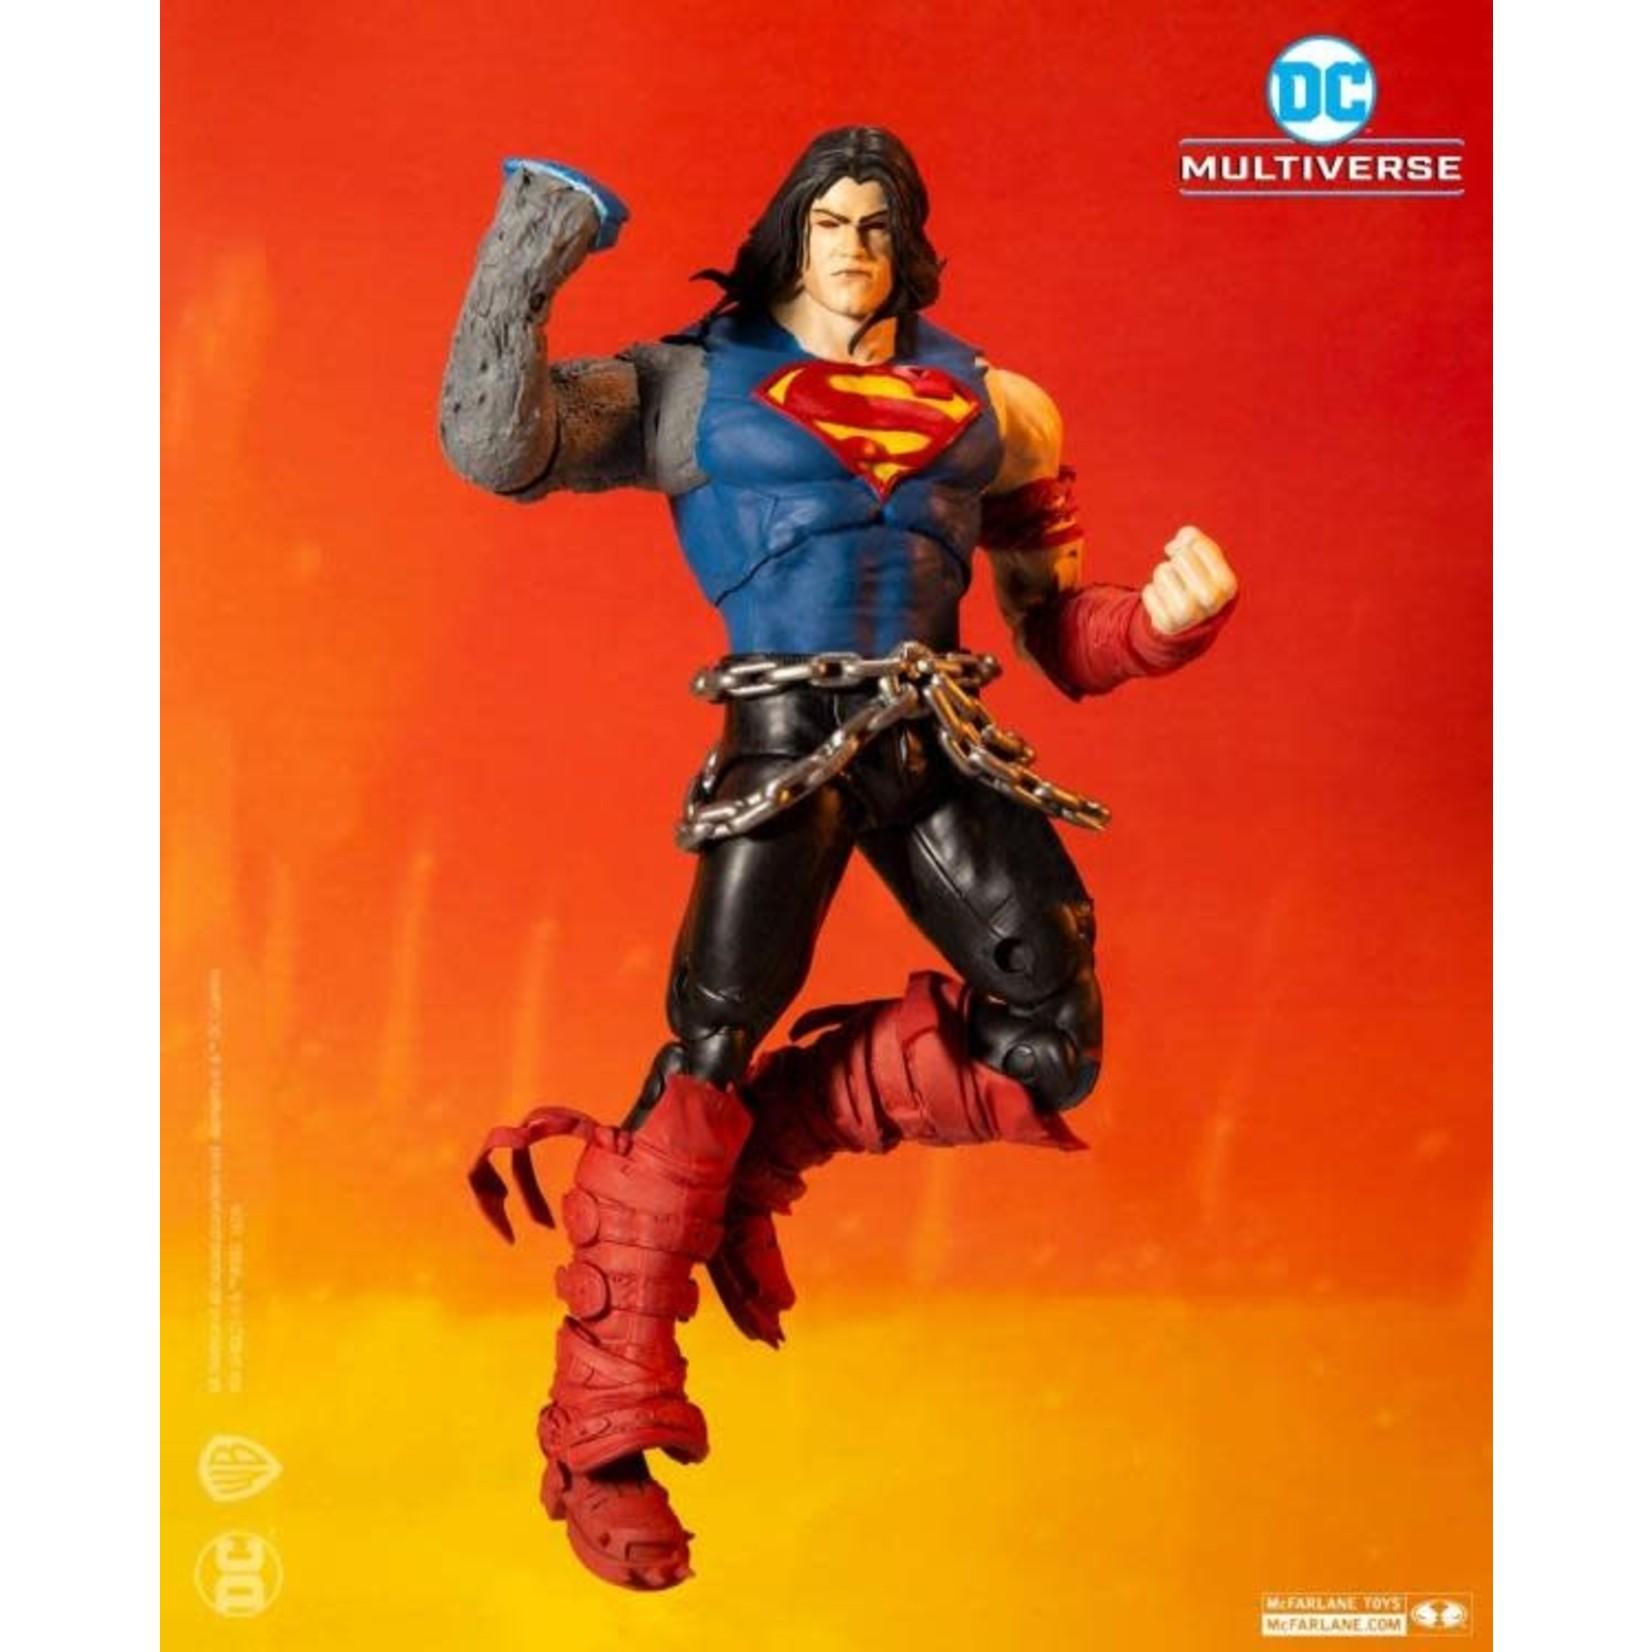 McFarlane Toys Dark Nights: Death Metal DC Multiverse Superman Action Figure (Collect to Build: Dark Father)